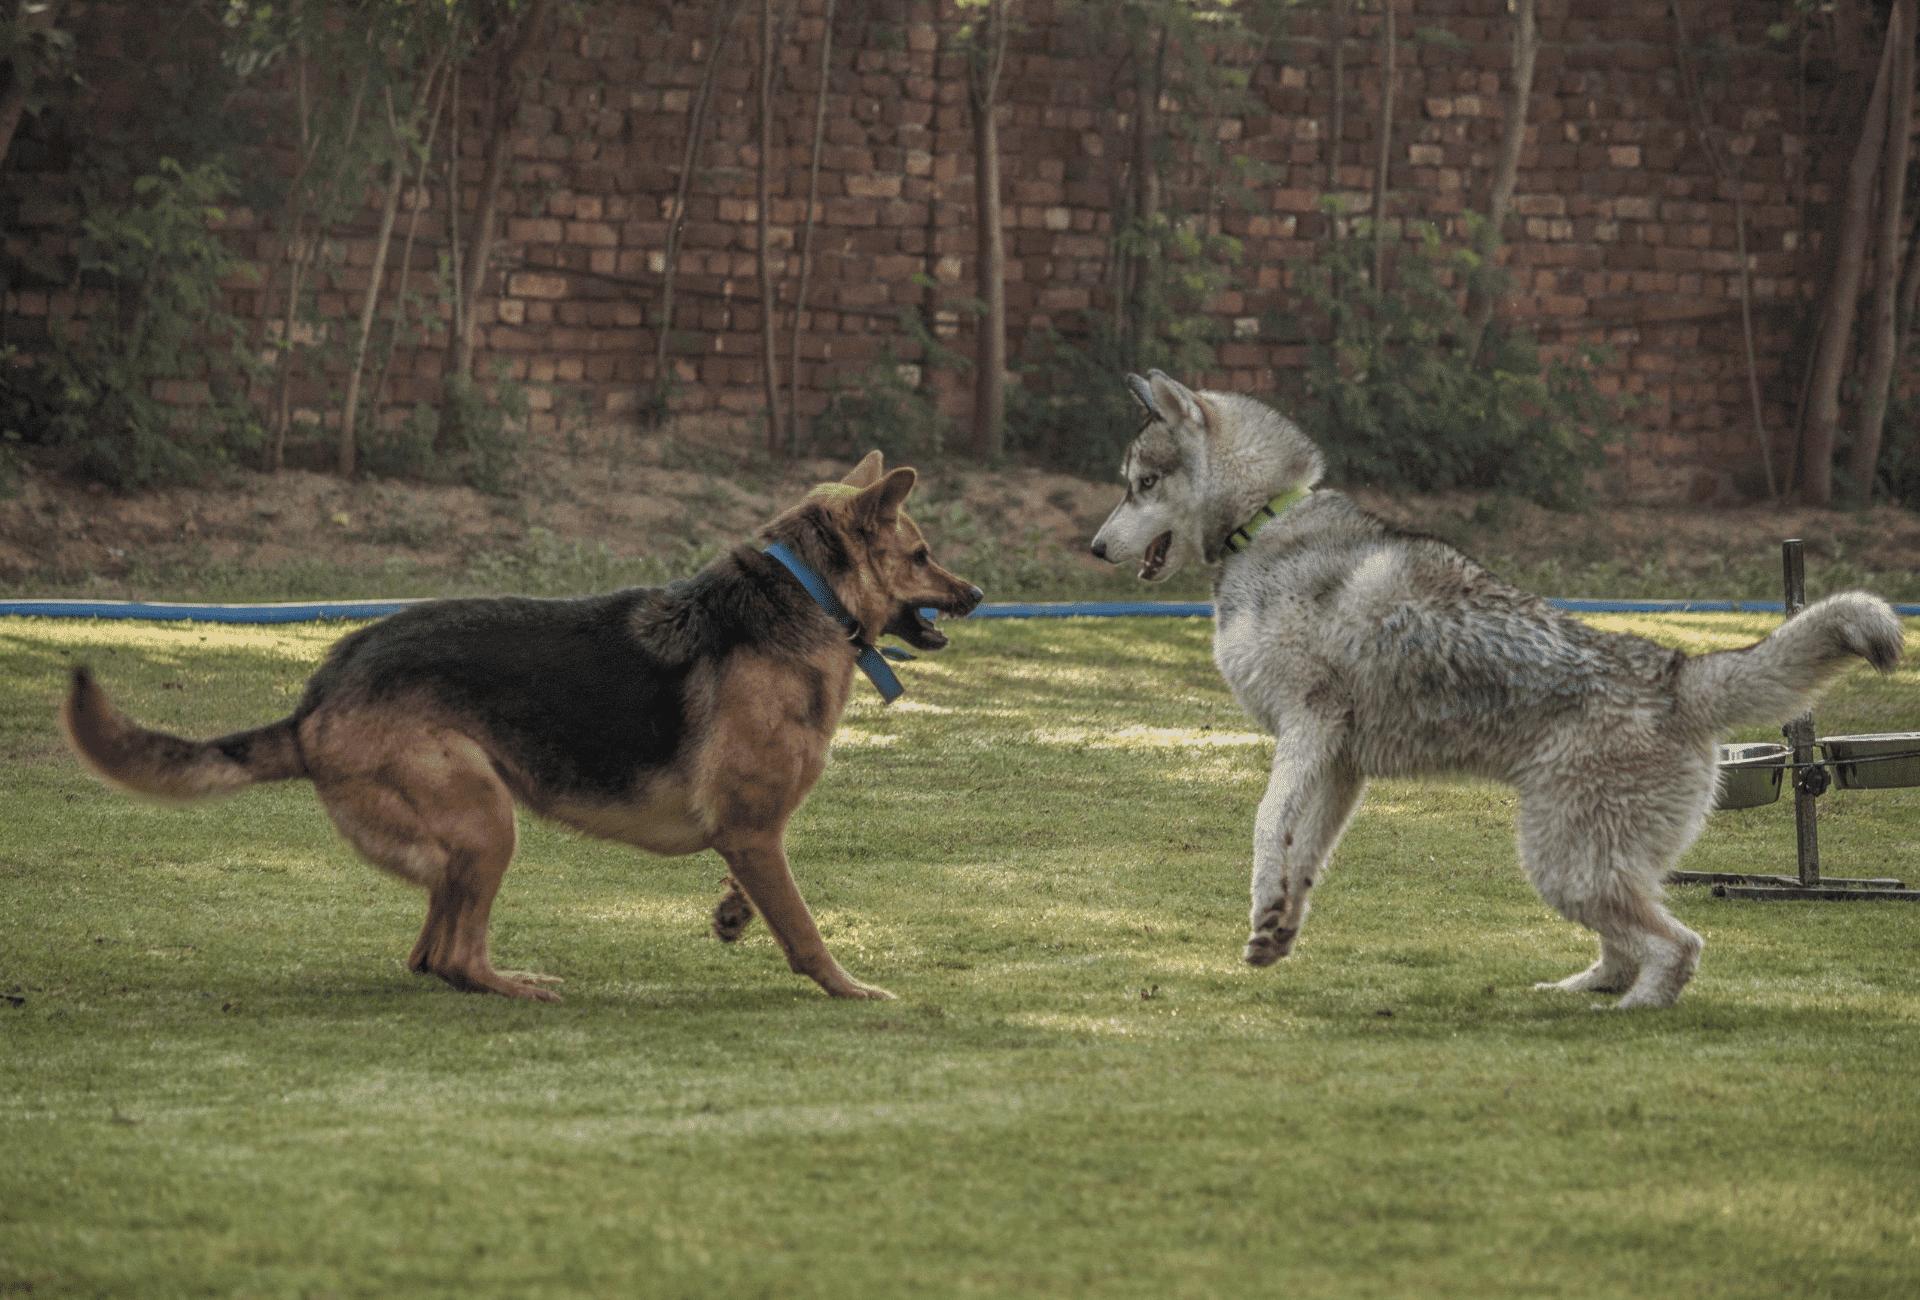 German Shepherd playing with Husky in the yard.